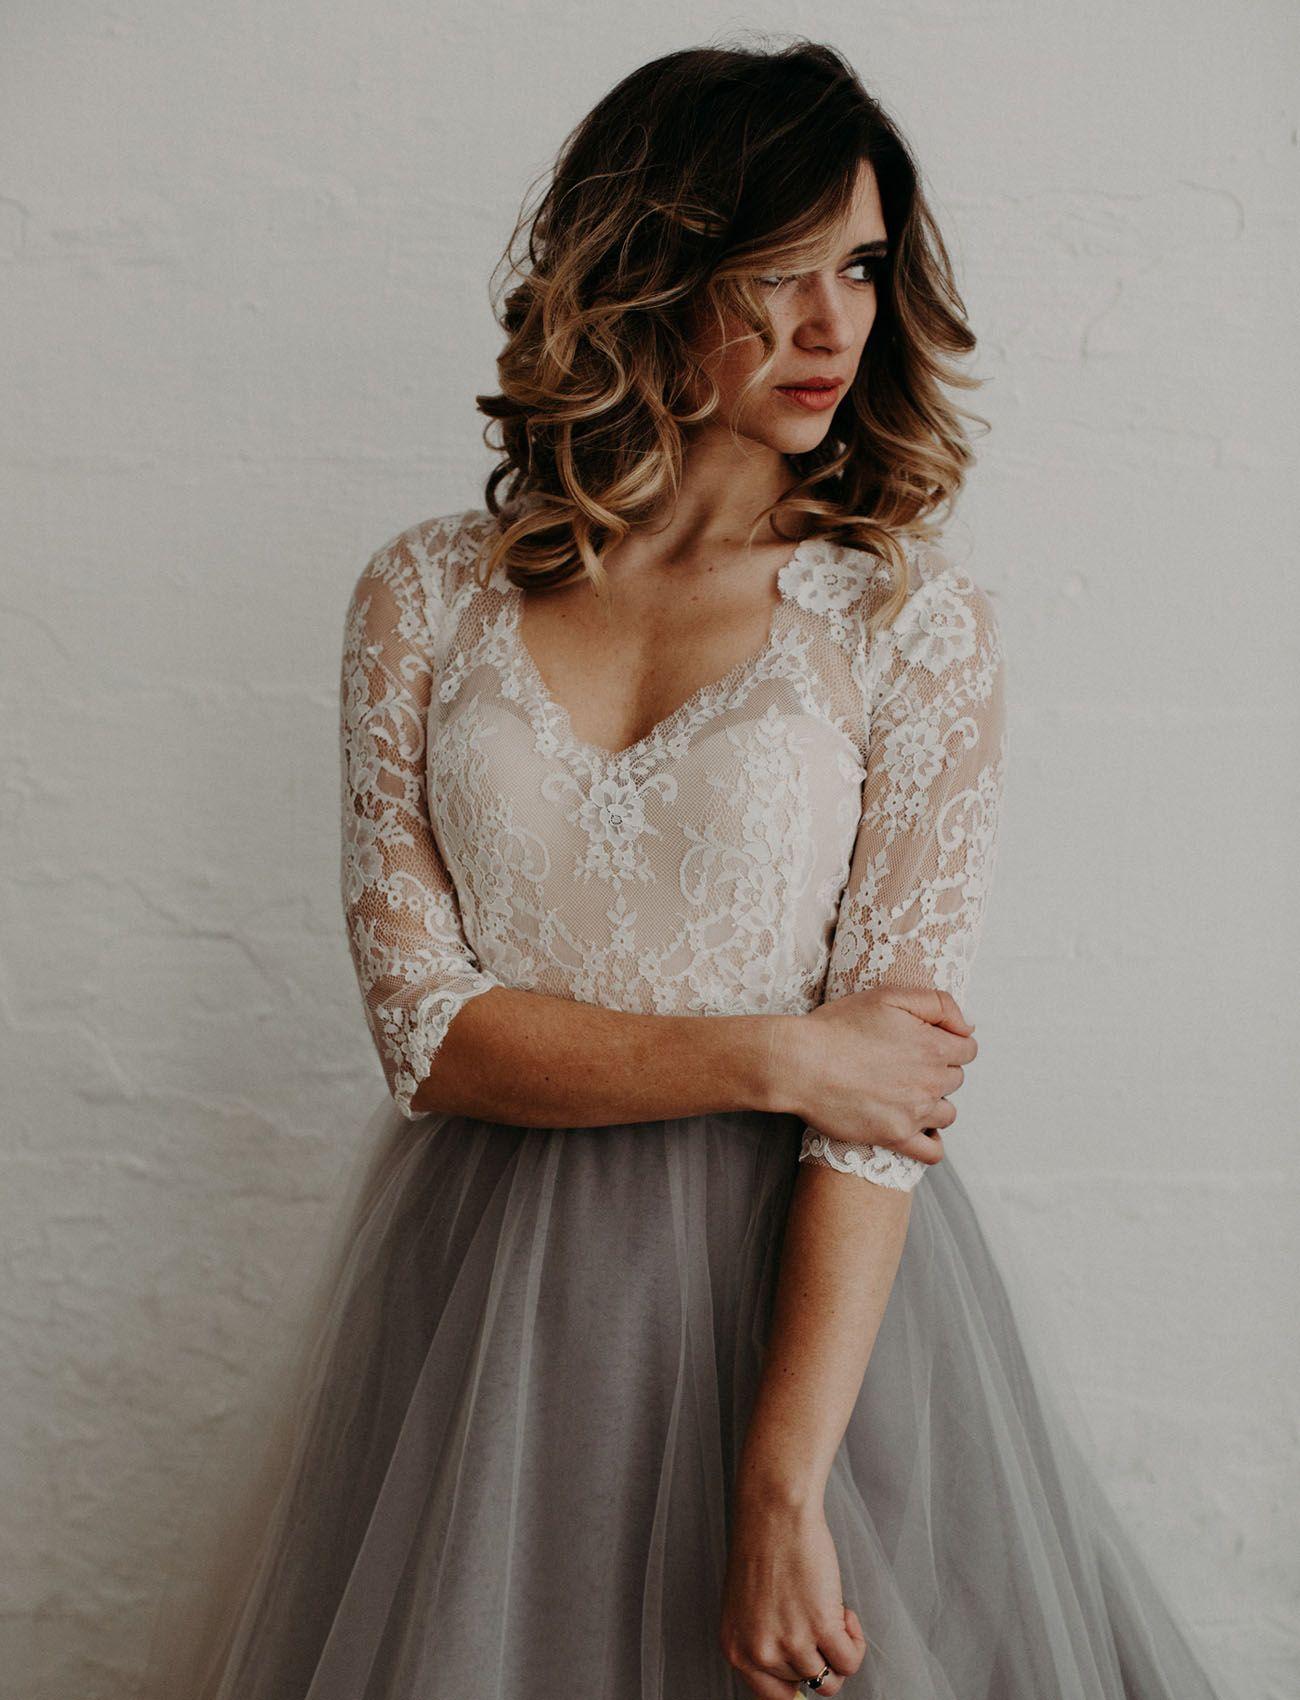 Modern Moody Wedding Inspiration Featuring A Gray Tulle Skirt Green Wedding Shoes Grey Wedding Dress Grey Tulle Skirt Wedding Dresses